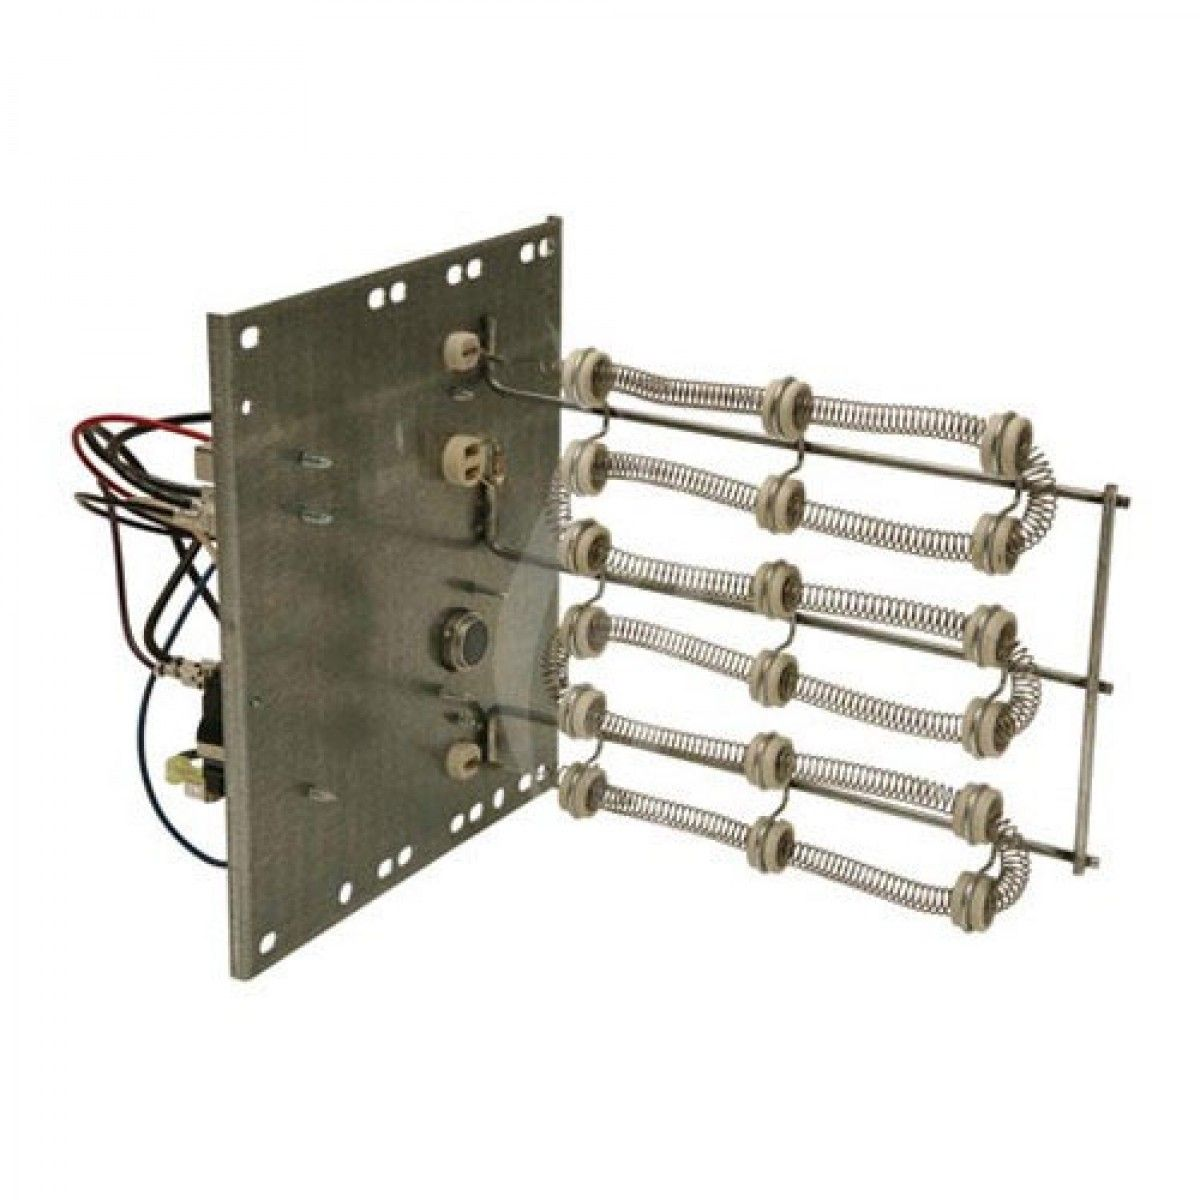 rheem rhsl wiring diagram 1993 chevy silverado fuel pump 20 kw rxbh electric strip heater with circuit breaker more views